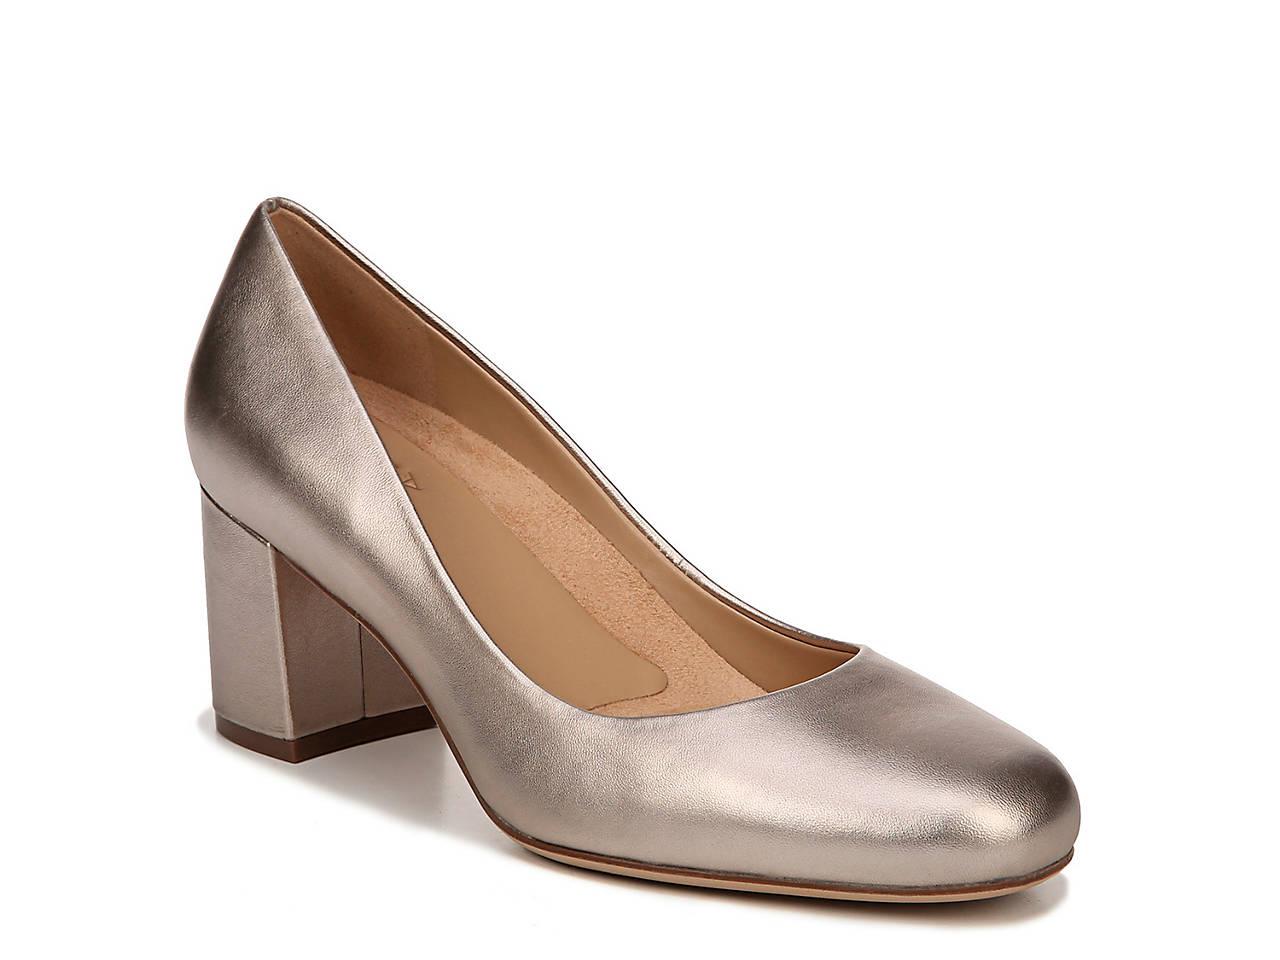 975e578f6c8 Naturalizer Whitney Pump Women s Shoes